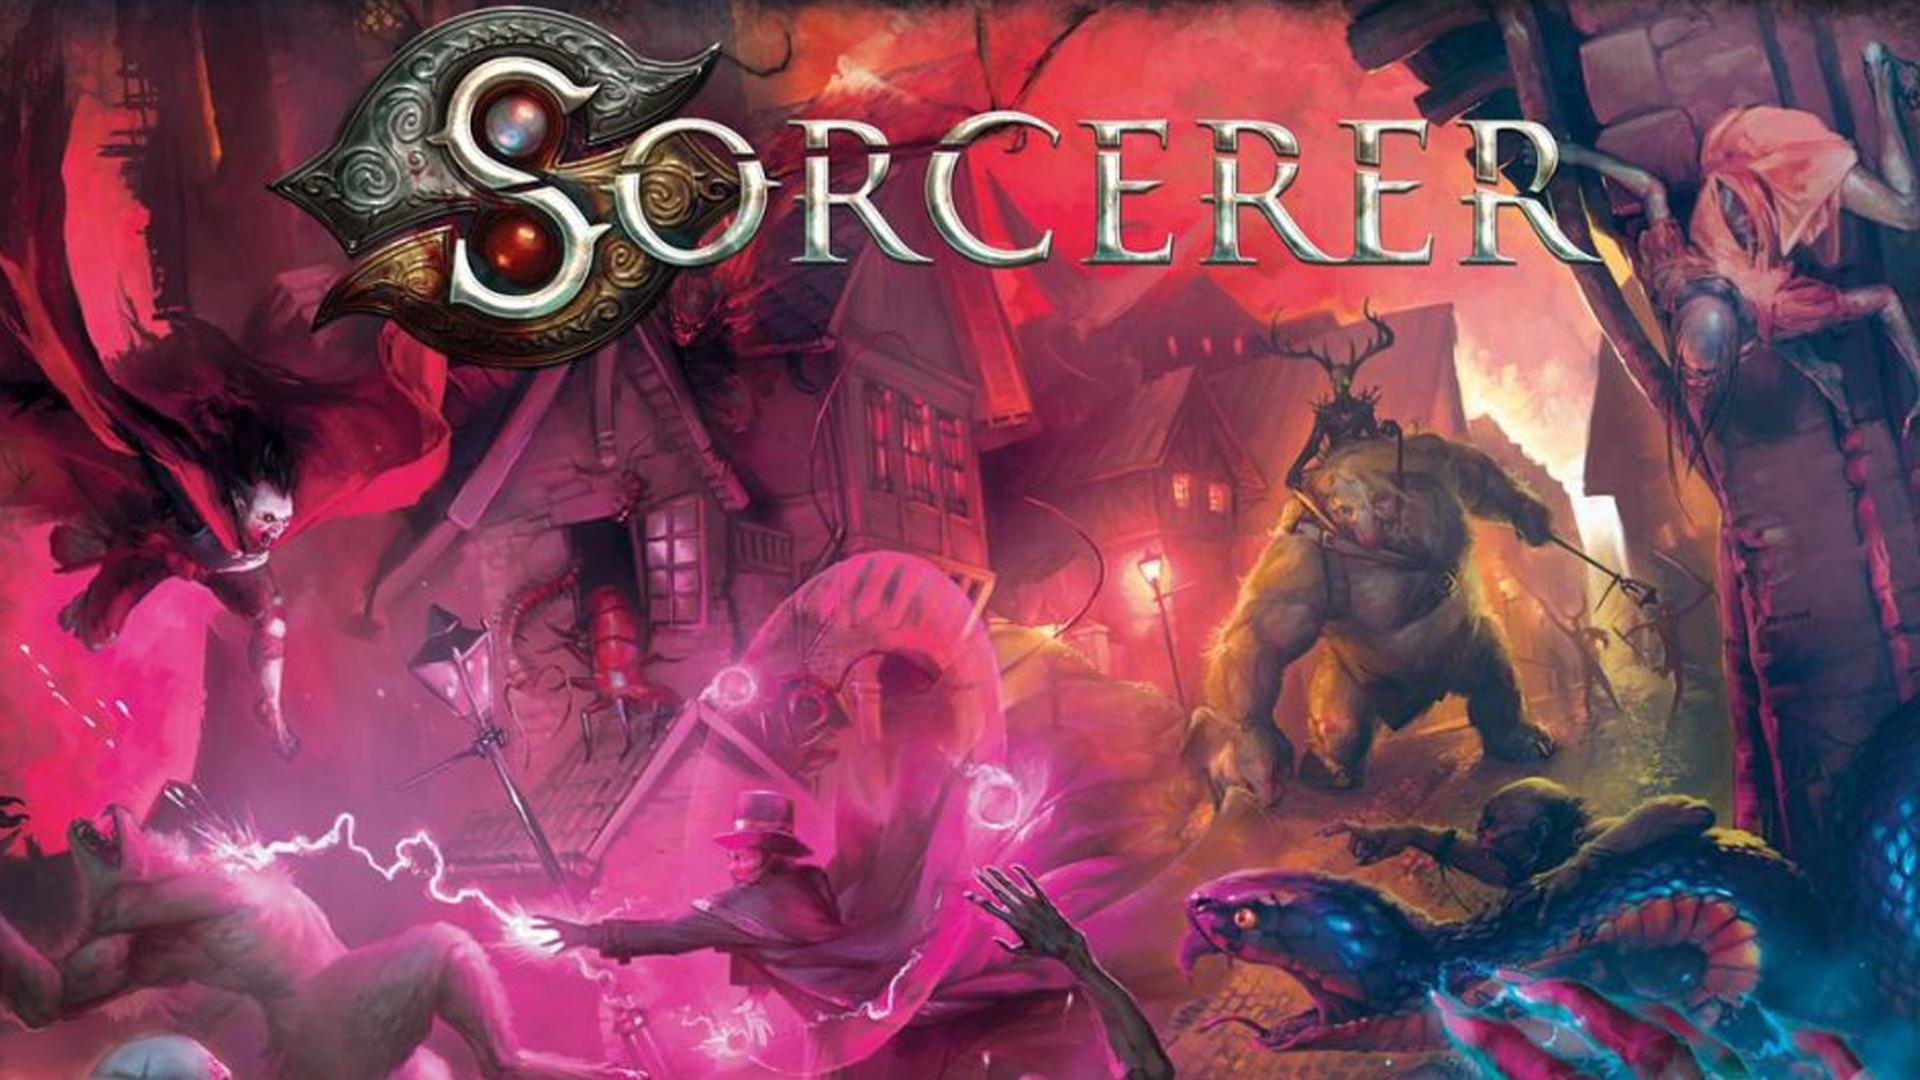 Sorceror_card_game.png